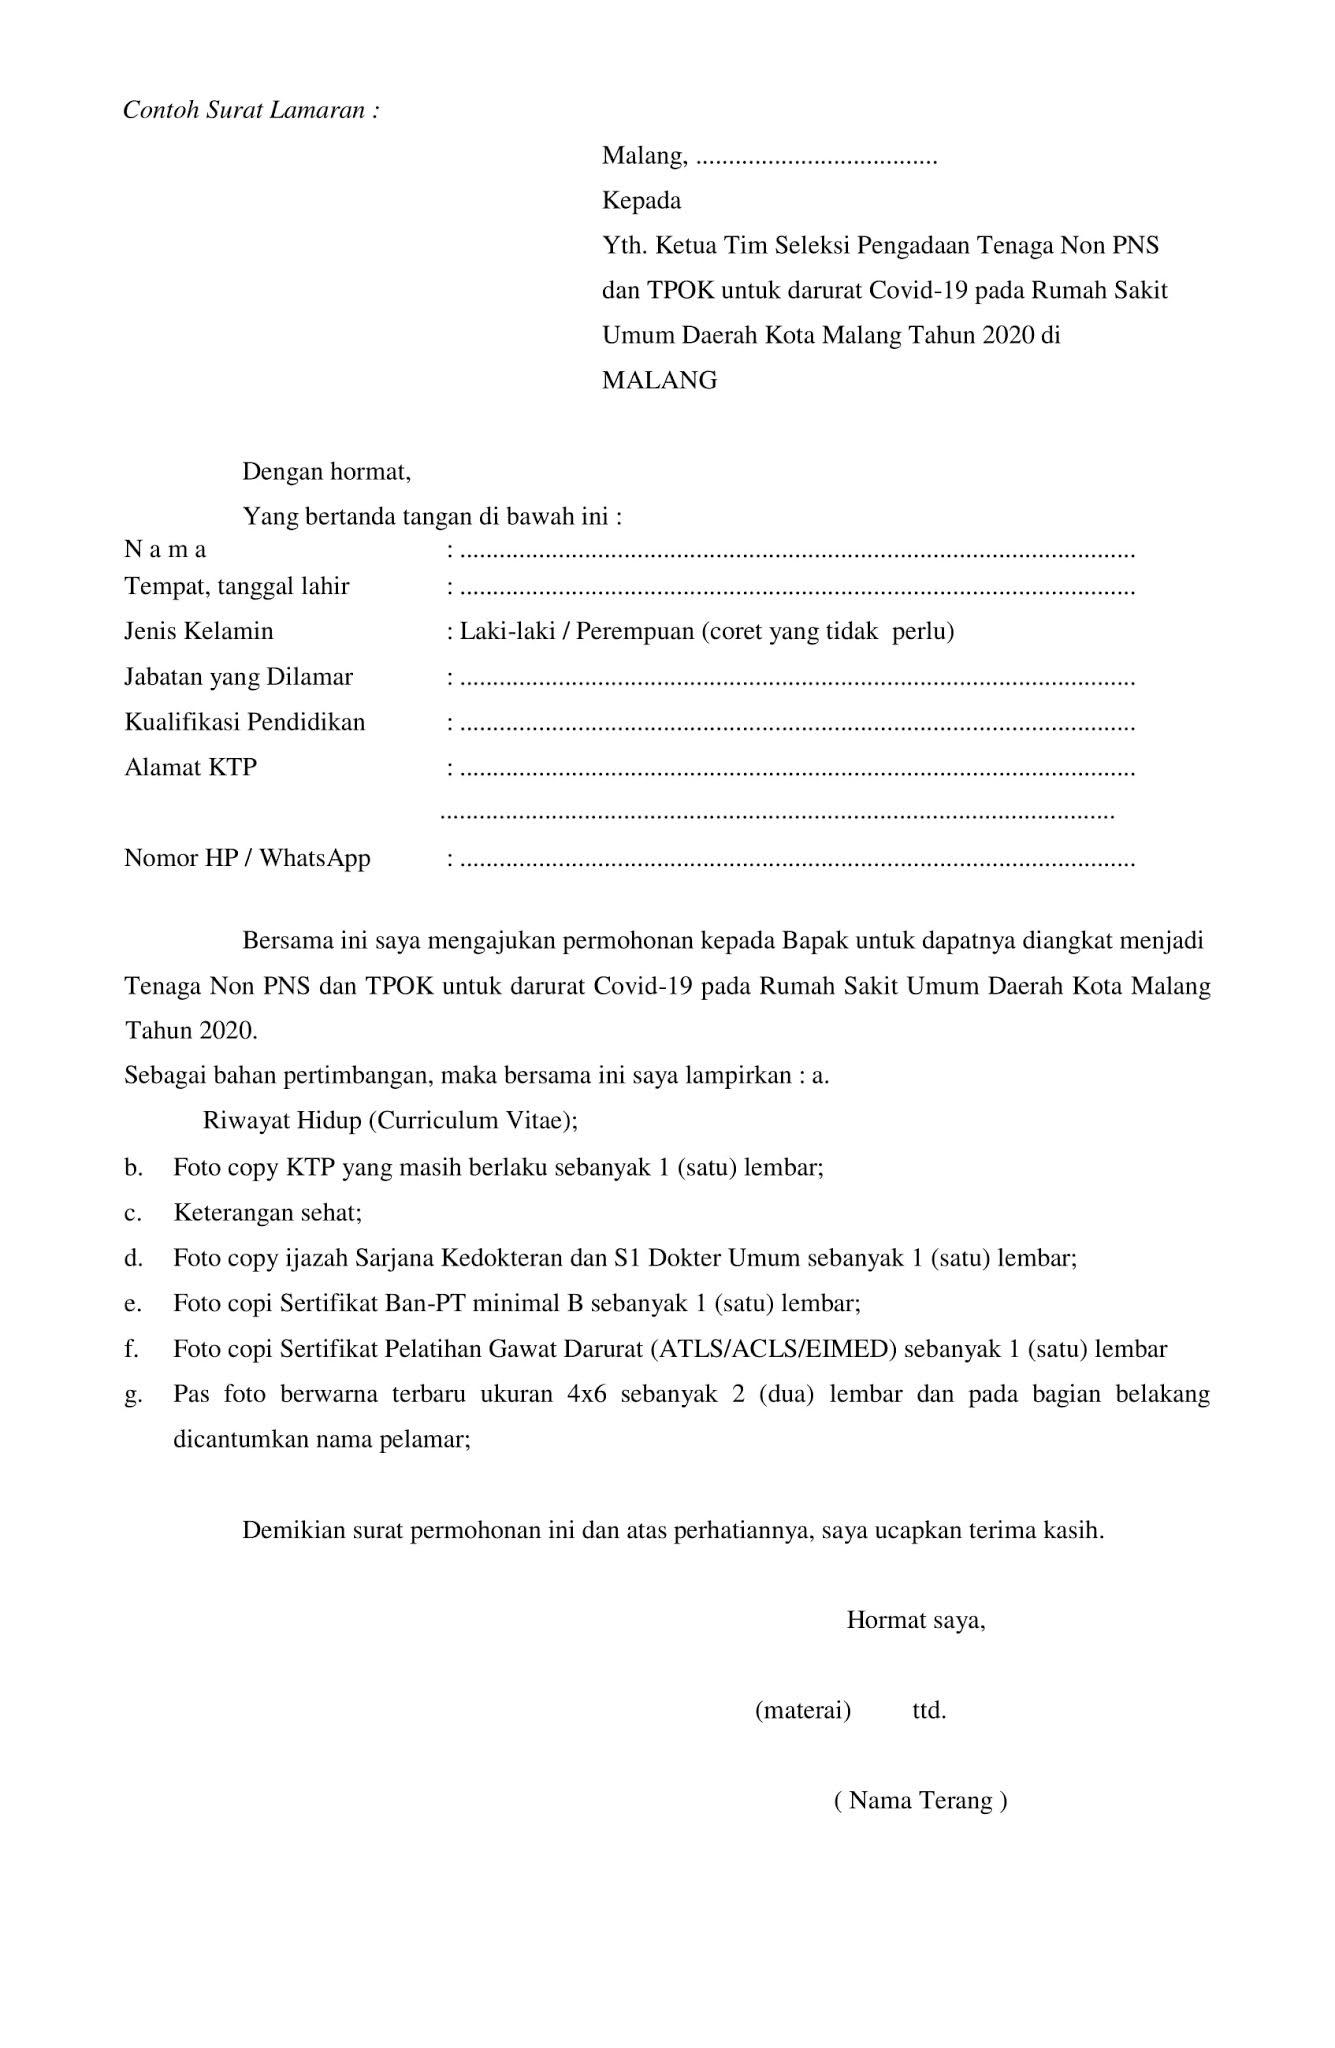 Lowongan Kerja Non Pns Rumah Sakit Umum Daerah Kota Malang Tingkat Sma D3 S1 Bulan Agustus 2020 Rekrutmen Lowongan Kerja Bulan Januari 2021